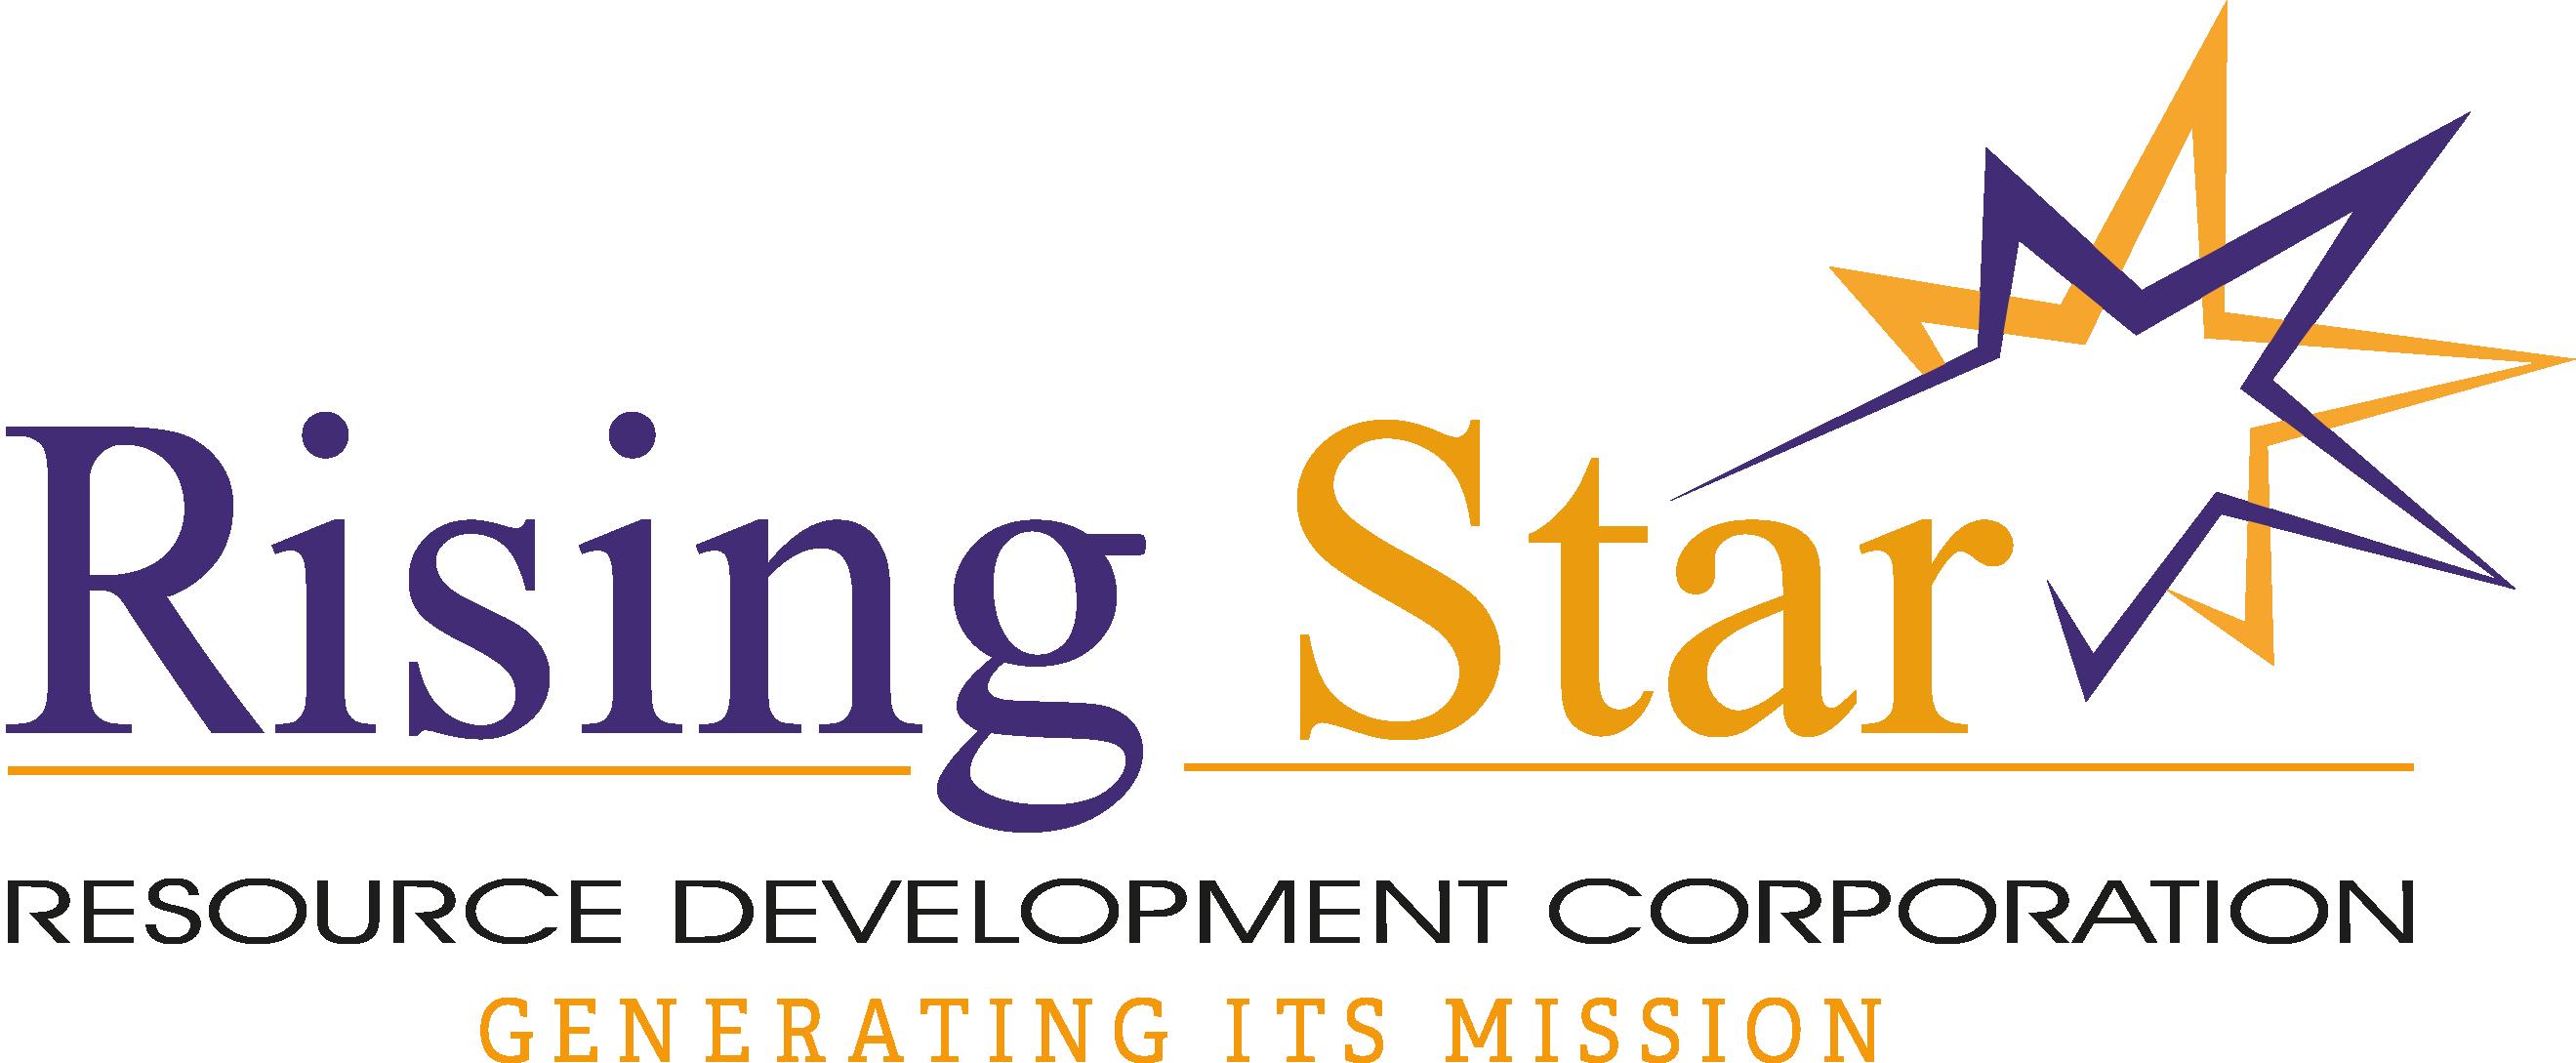 Rising Star Resource Development Corporation